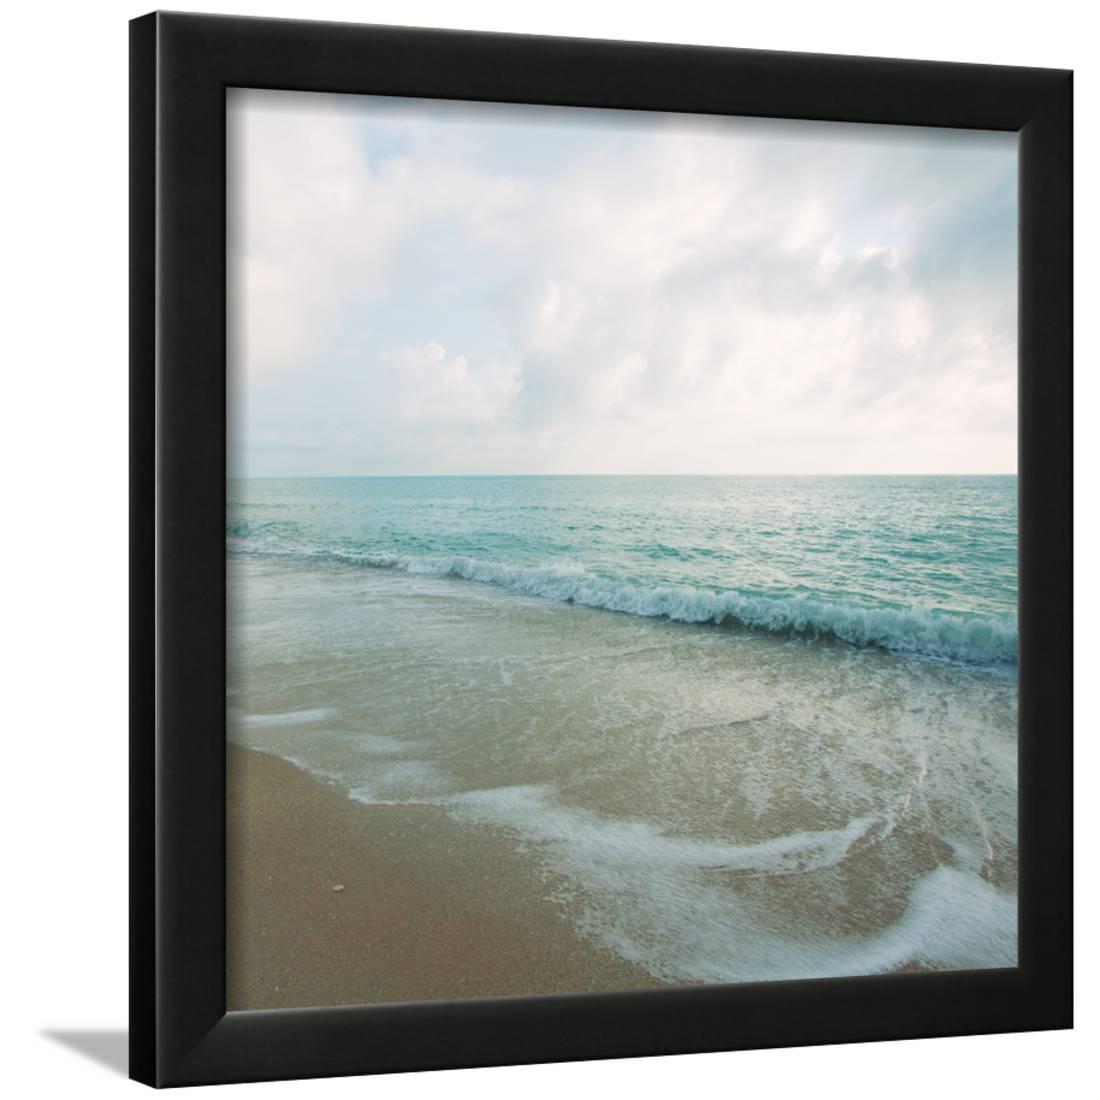 beach scene iii framed print wall art by susan bryant. Black Bedroom Furniture Sets. Home Design Ideas